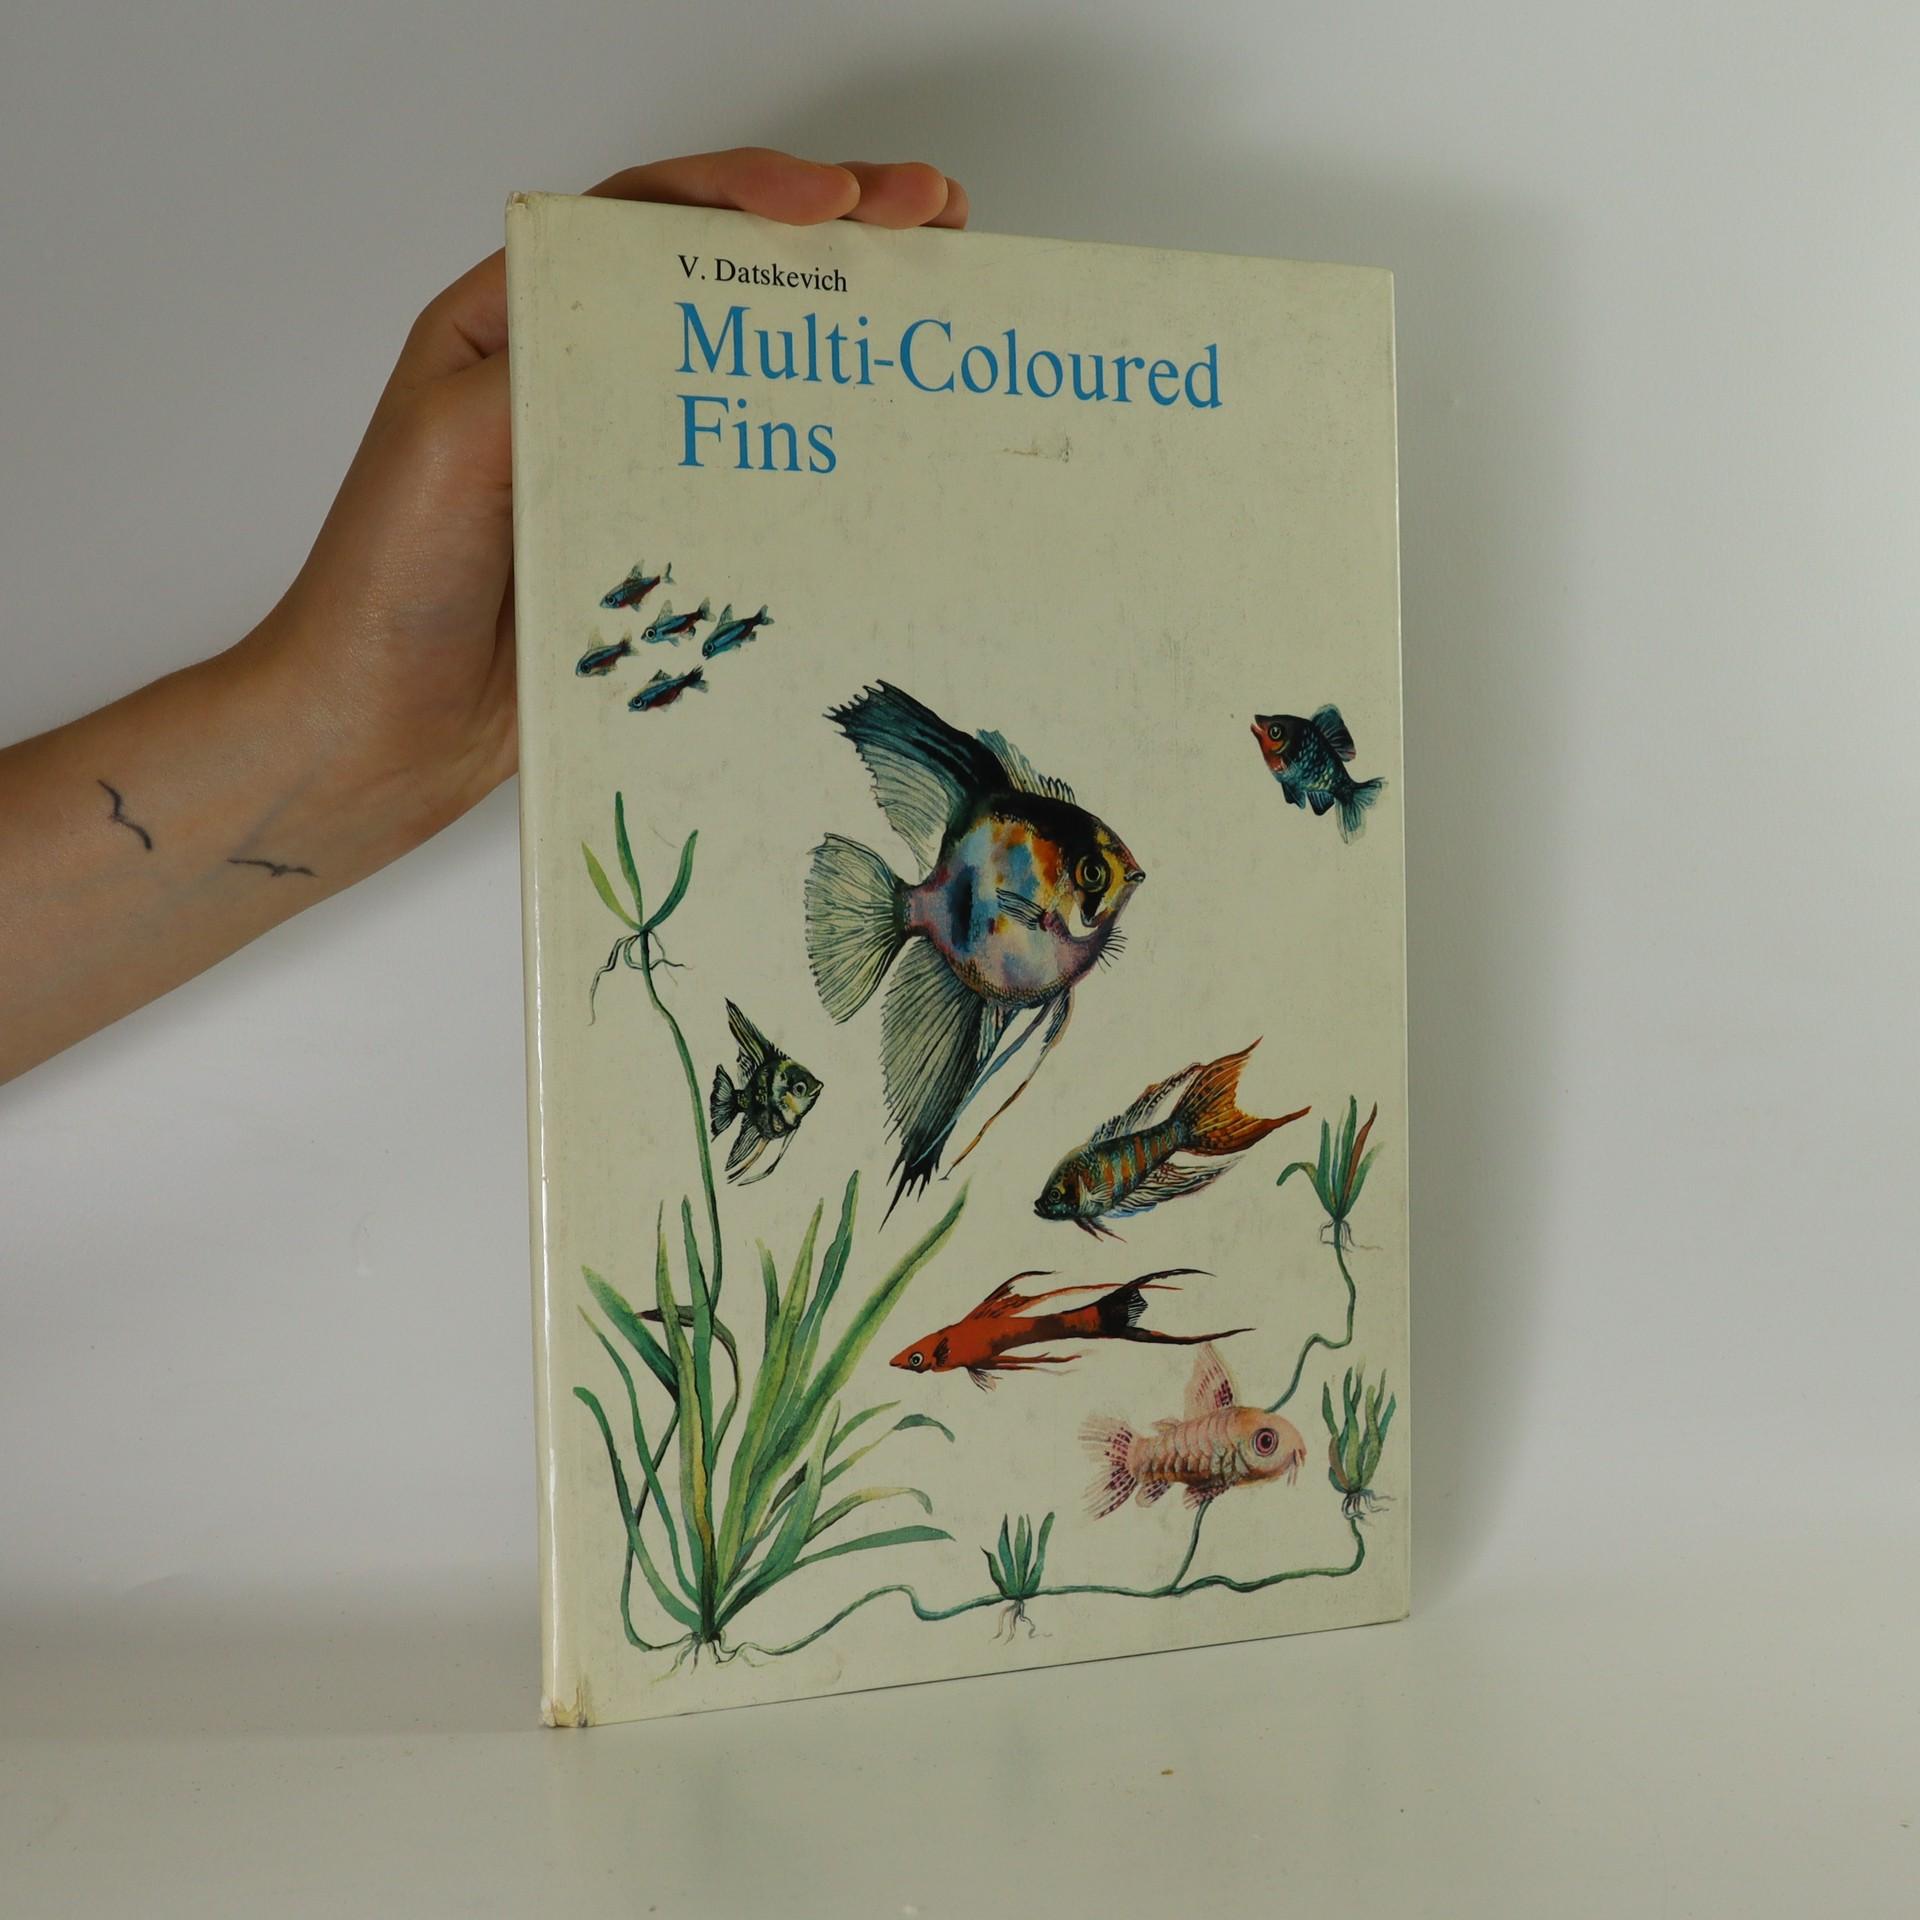 antikvární kniha Multi-Coloured Fins, 1983